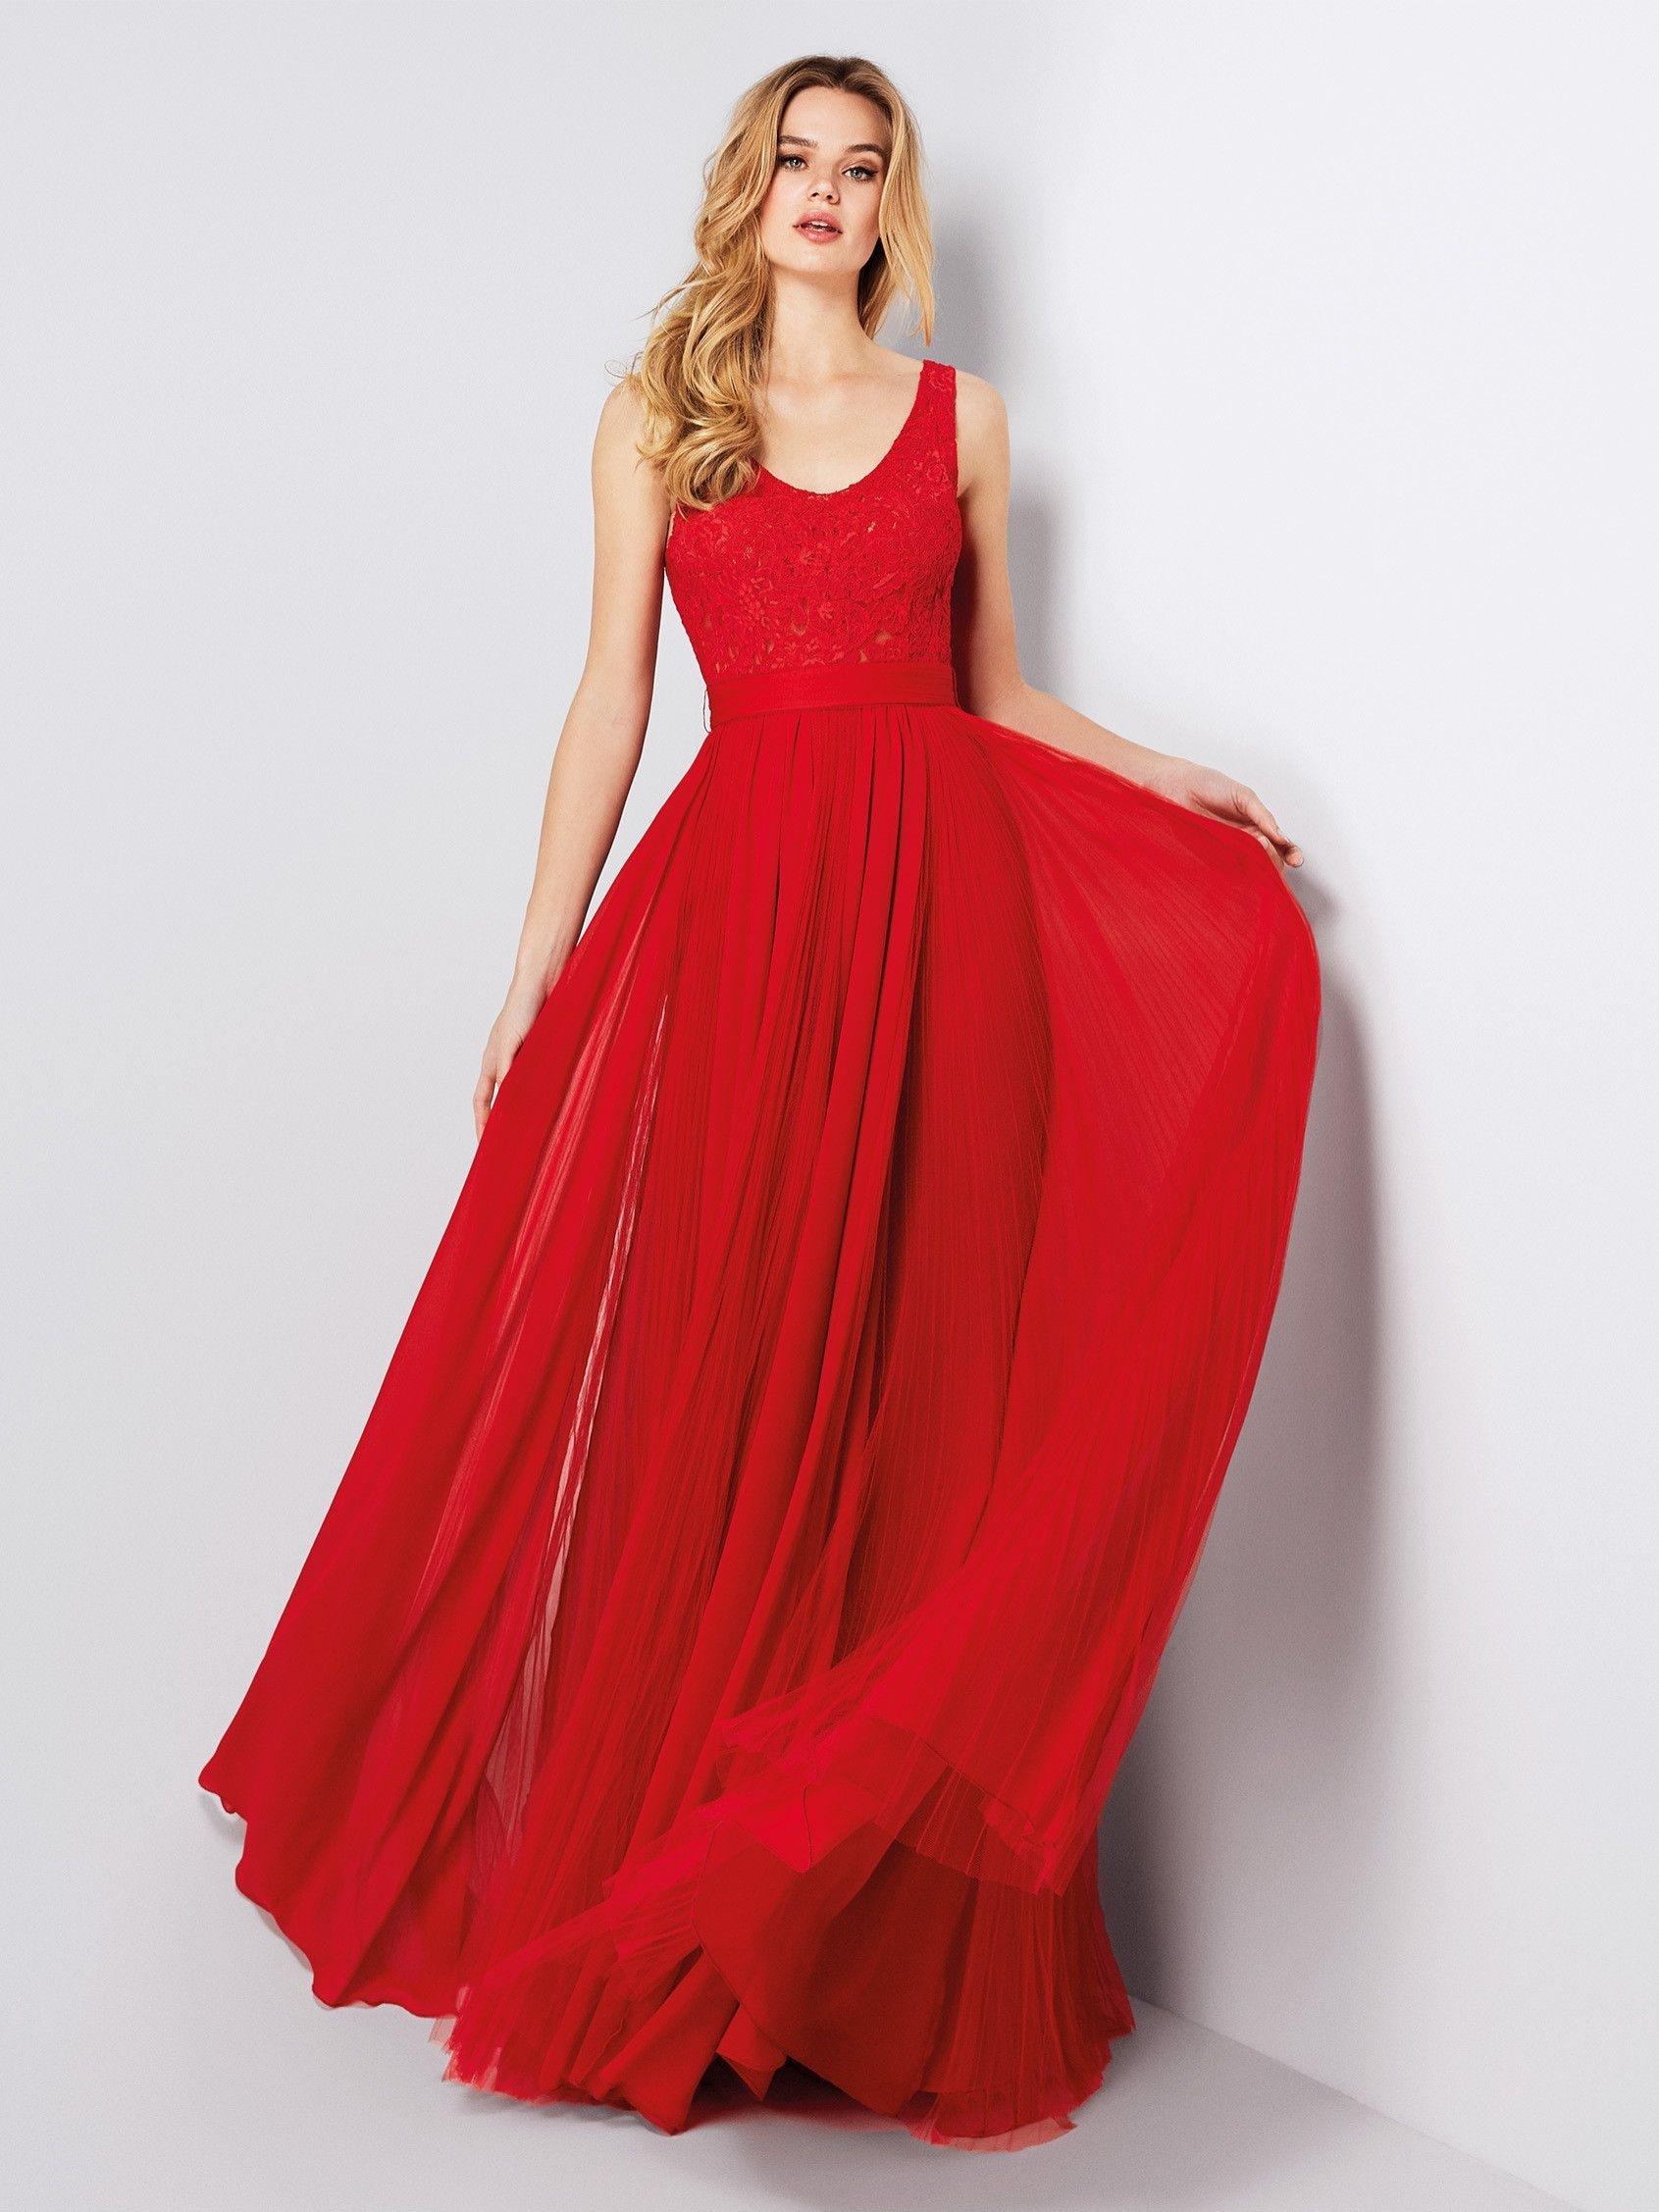 20 Einfach Abendkleid Rot Ärmel20 Großartig Abendkleid Rot Bester Preis